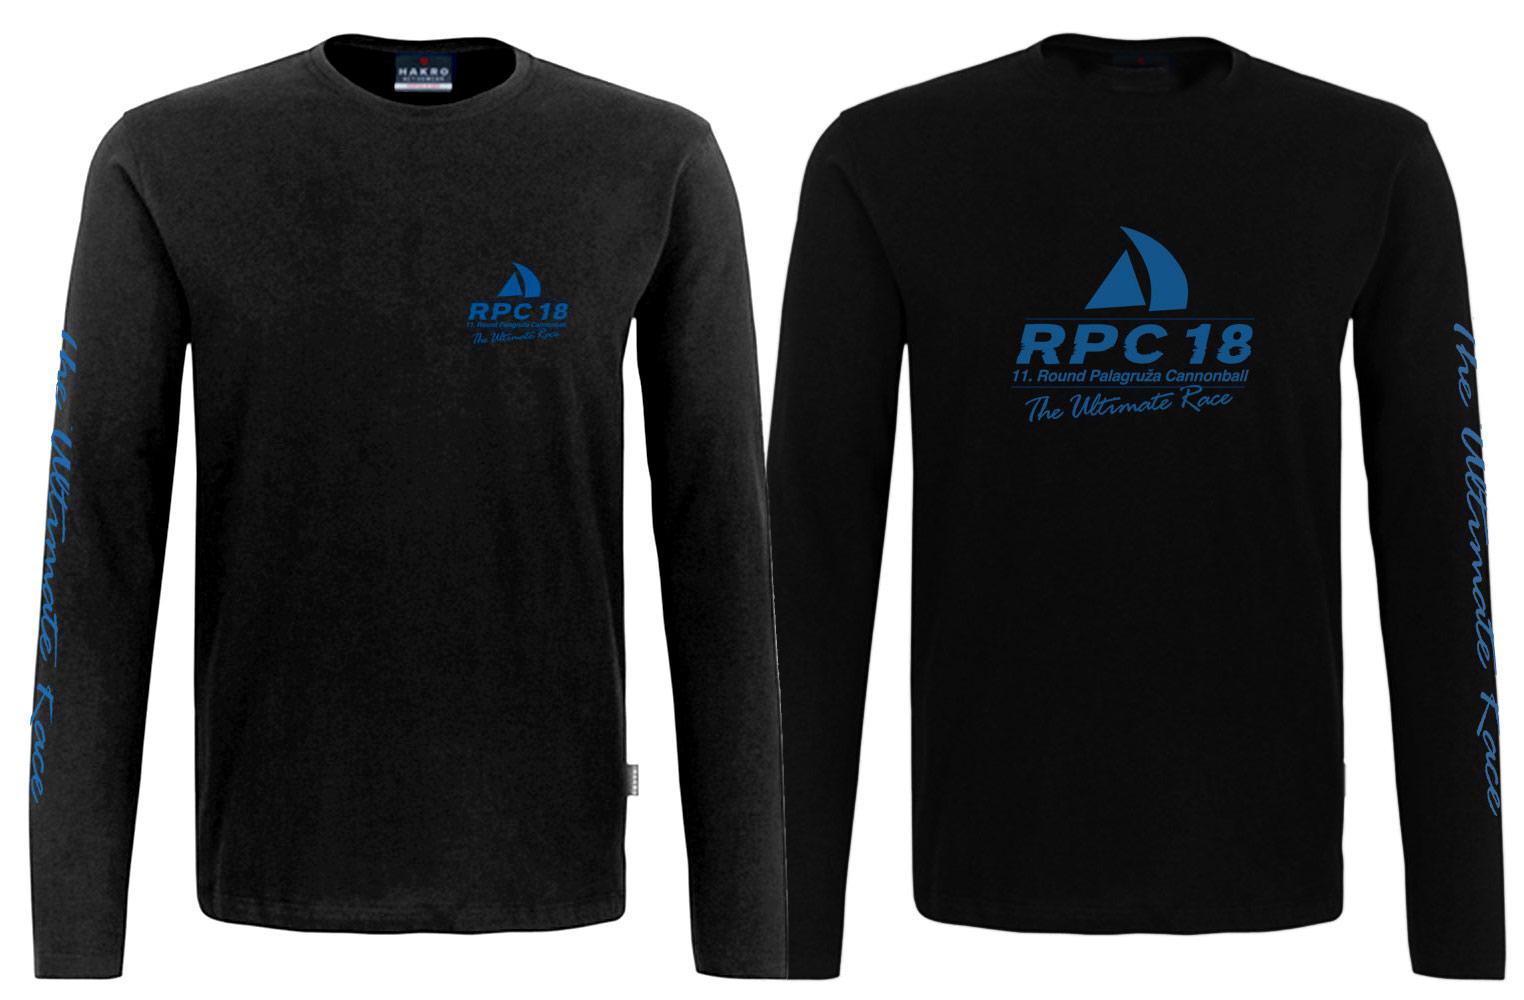 T-Shirts RPC 2018 – Workline - Andreas Malak GmbH